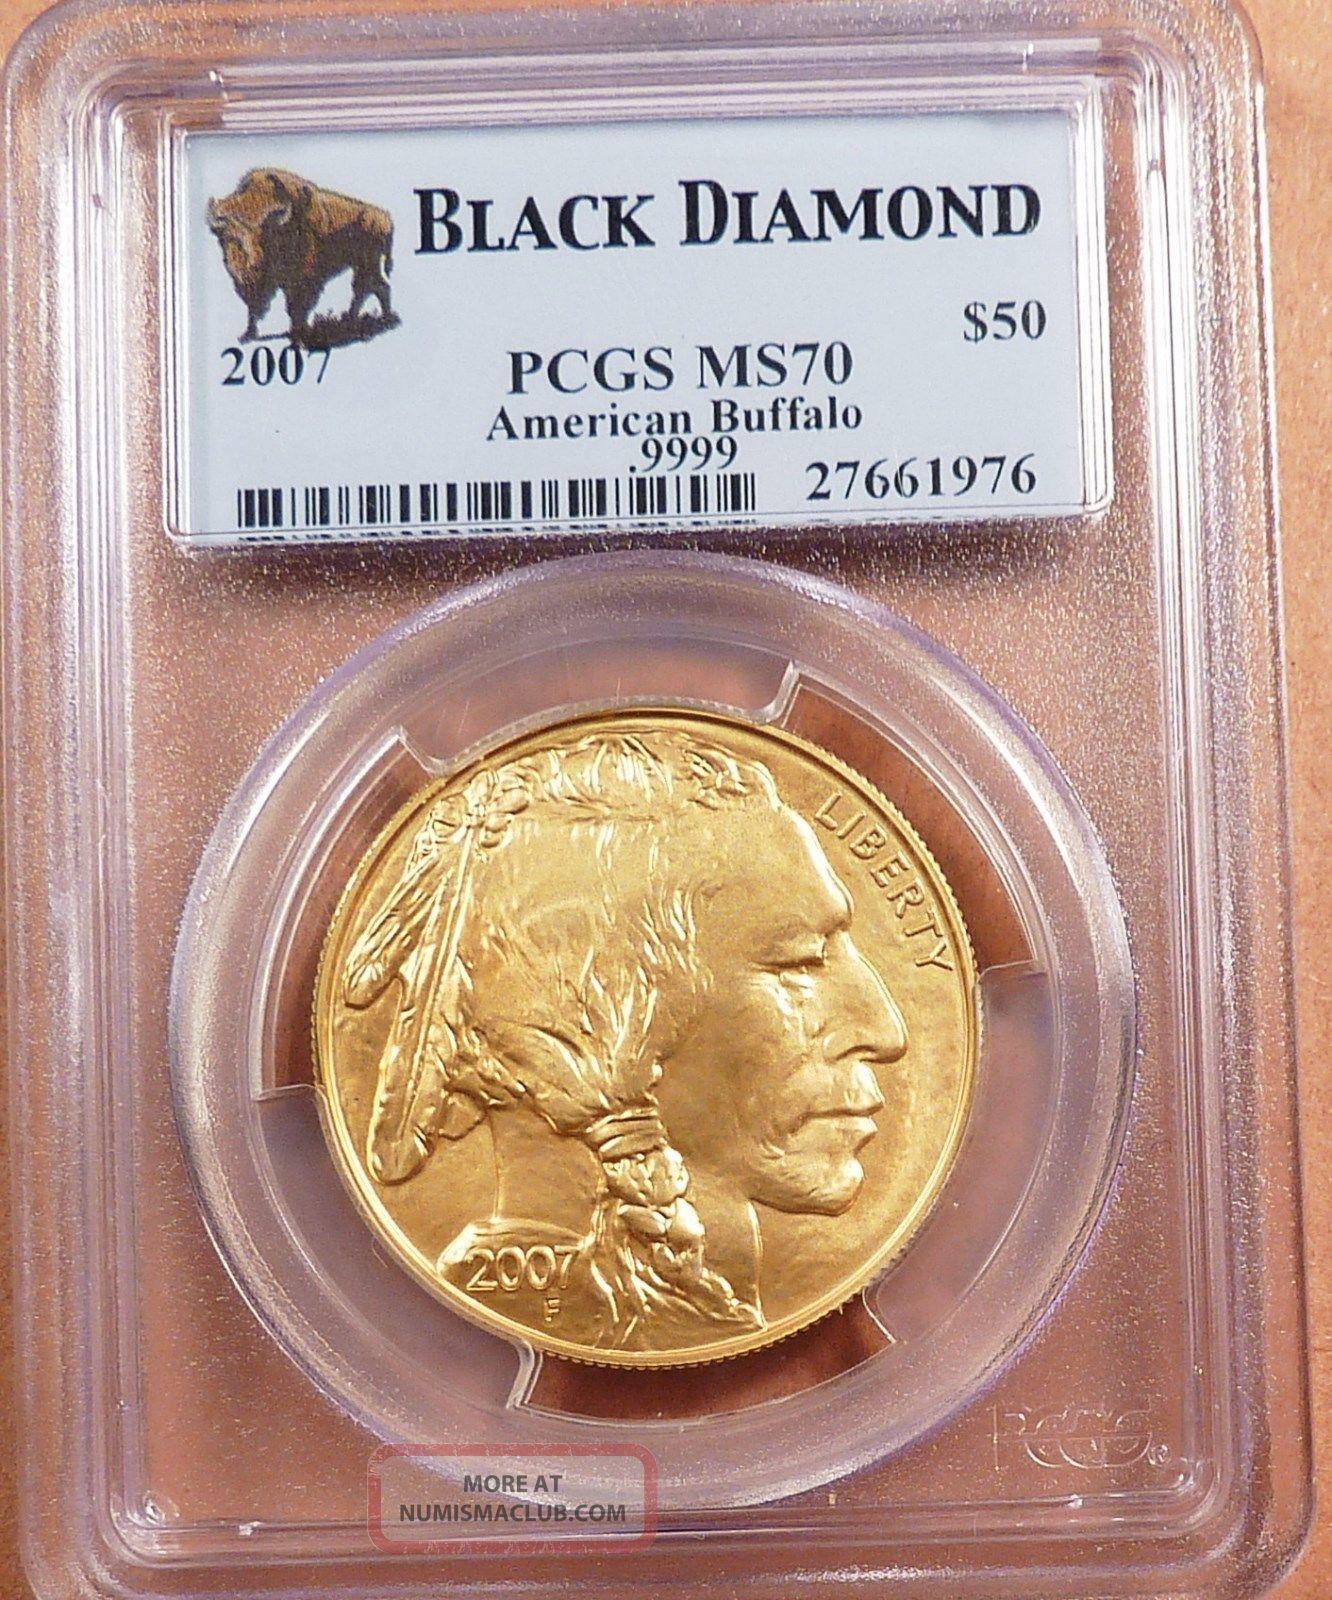 2007 50 Buffalo Gold Pcgs Graded Ms70 Black Diamond 1